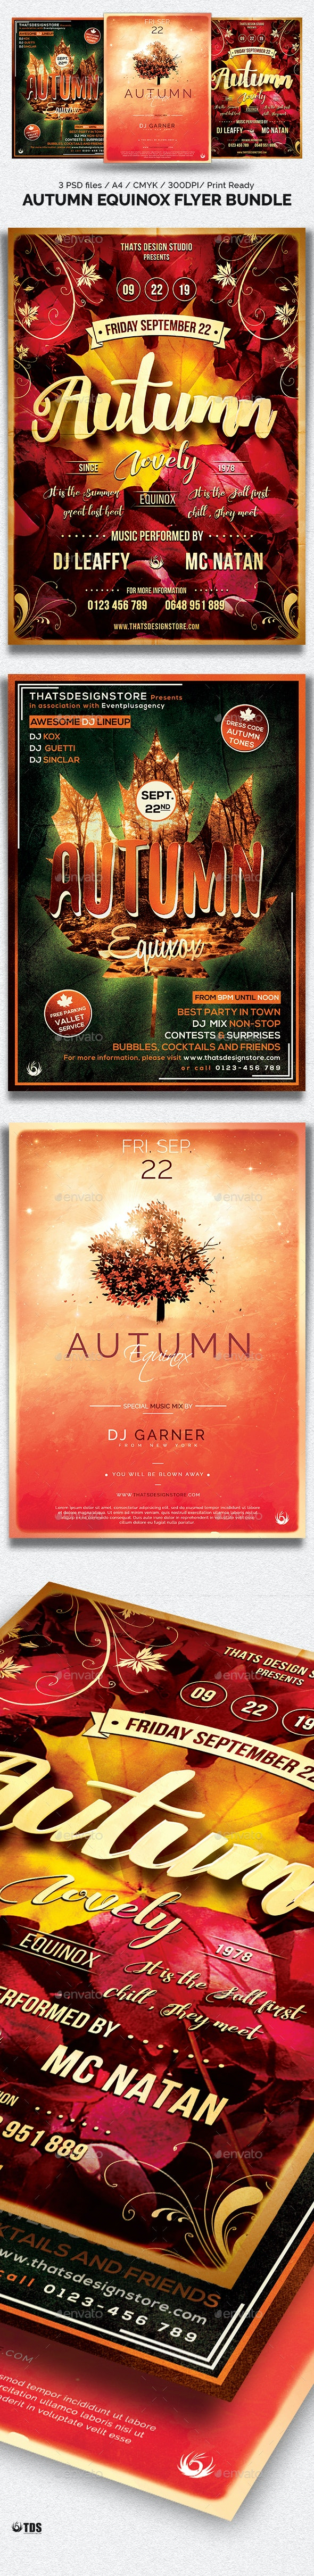 Autumn Equinox Flyer Bundle - Clubs & Parties Events